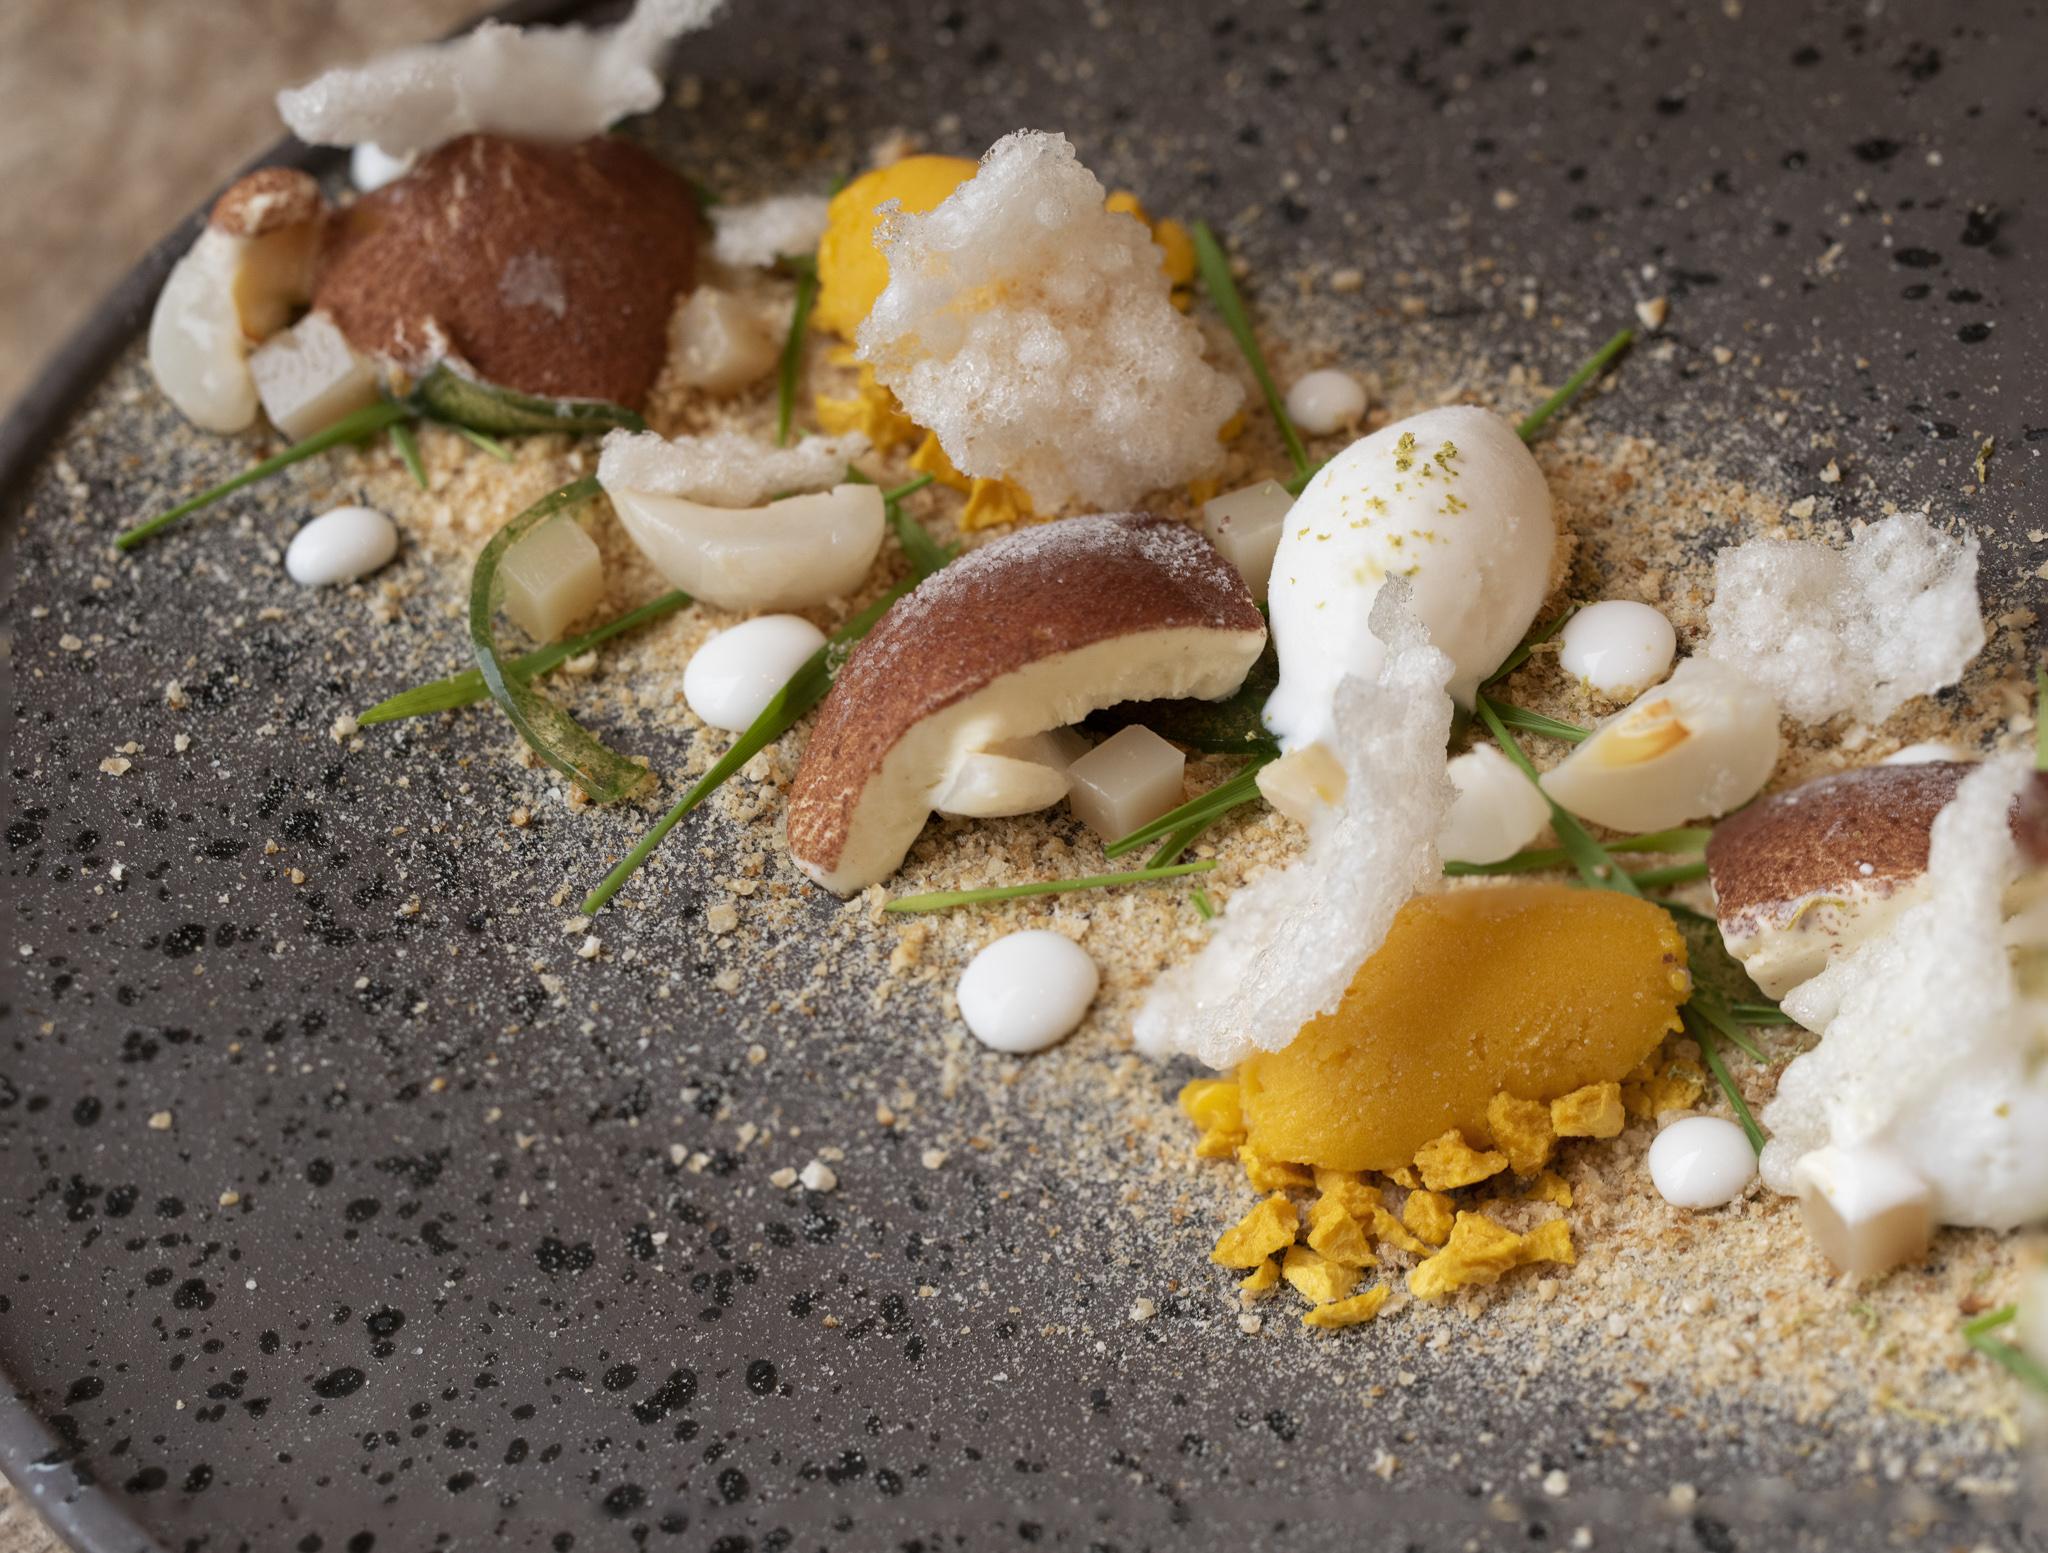 Kai Mayfair - Dessert - Coconut, Lychee & Mango by the Beach.jpg